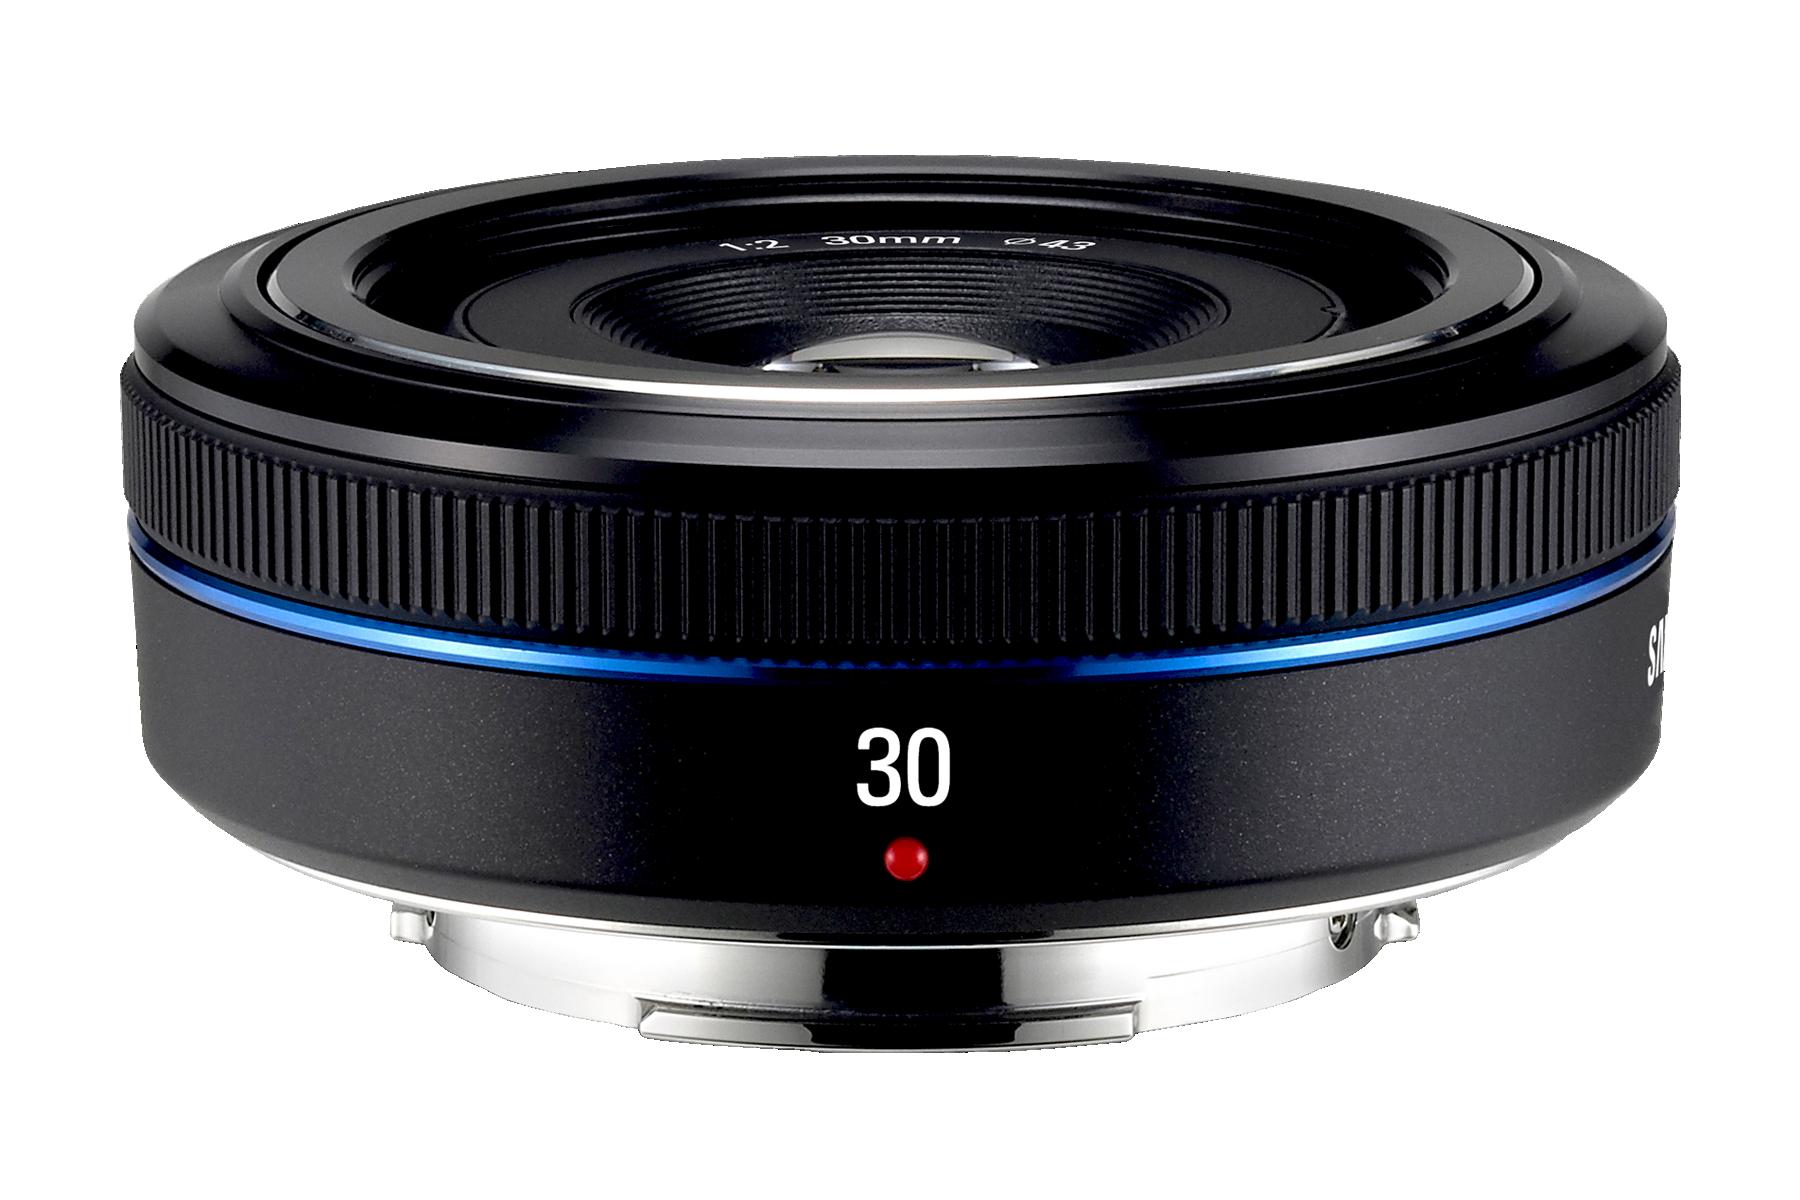 30mm f2.0 Prime Lens